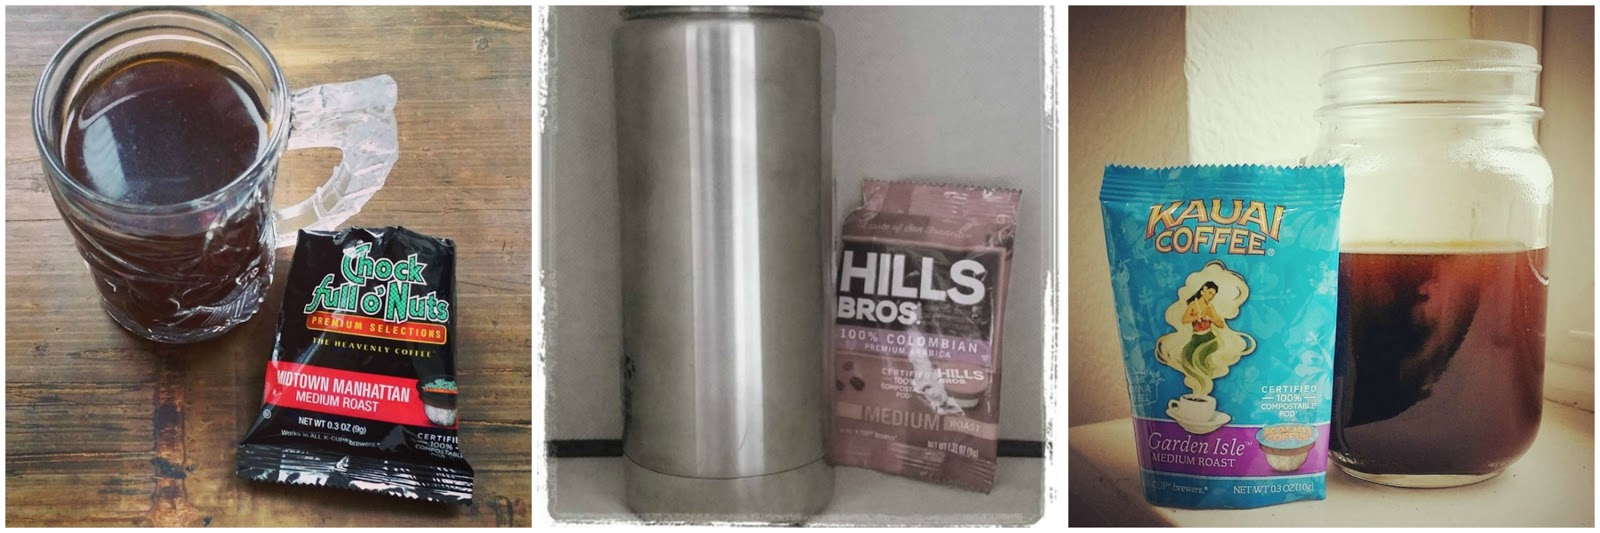 Brew Bros Coffee Openrice